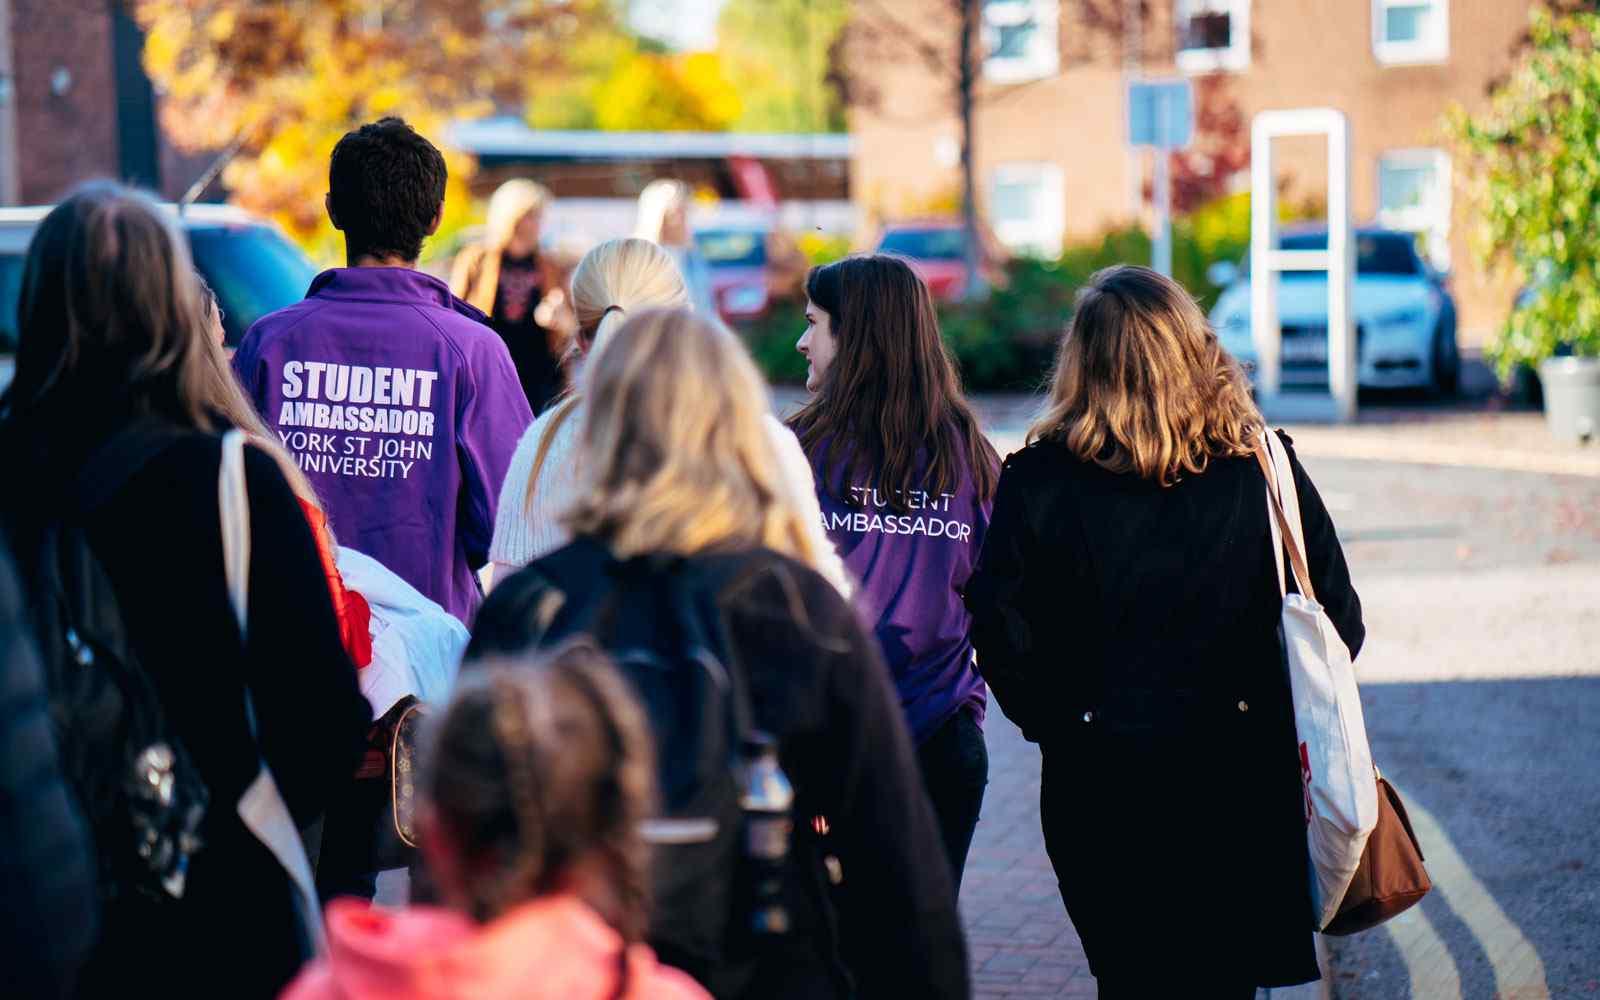 Prospective students and York St John Student Ambassadors walking on campus